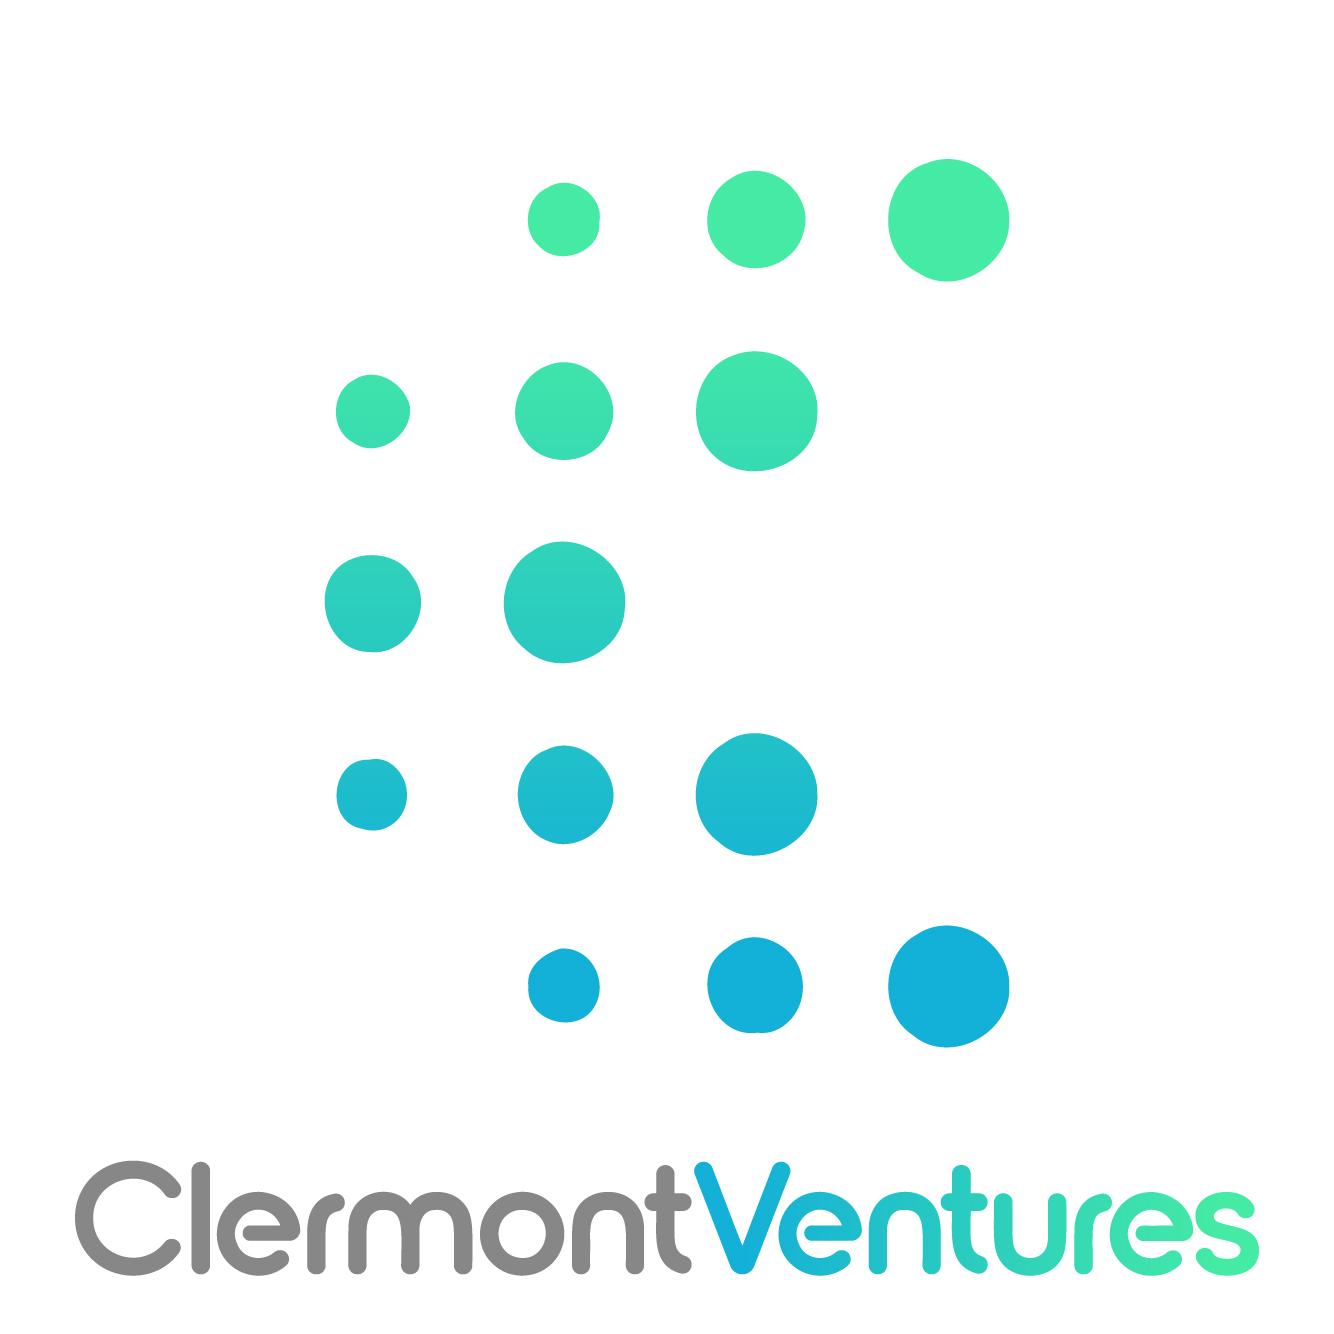 Clermont Ventures